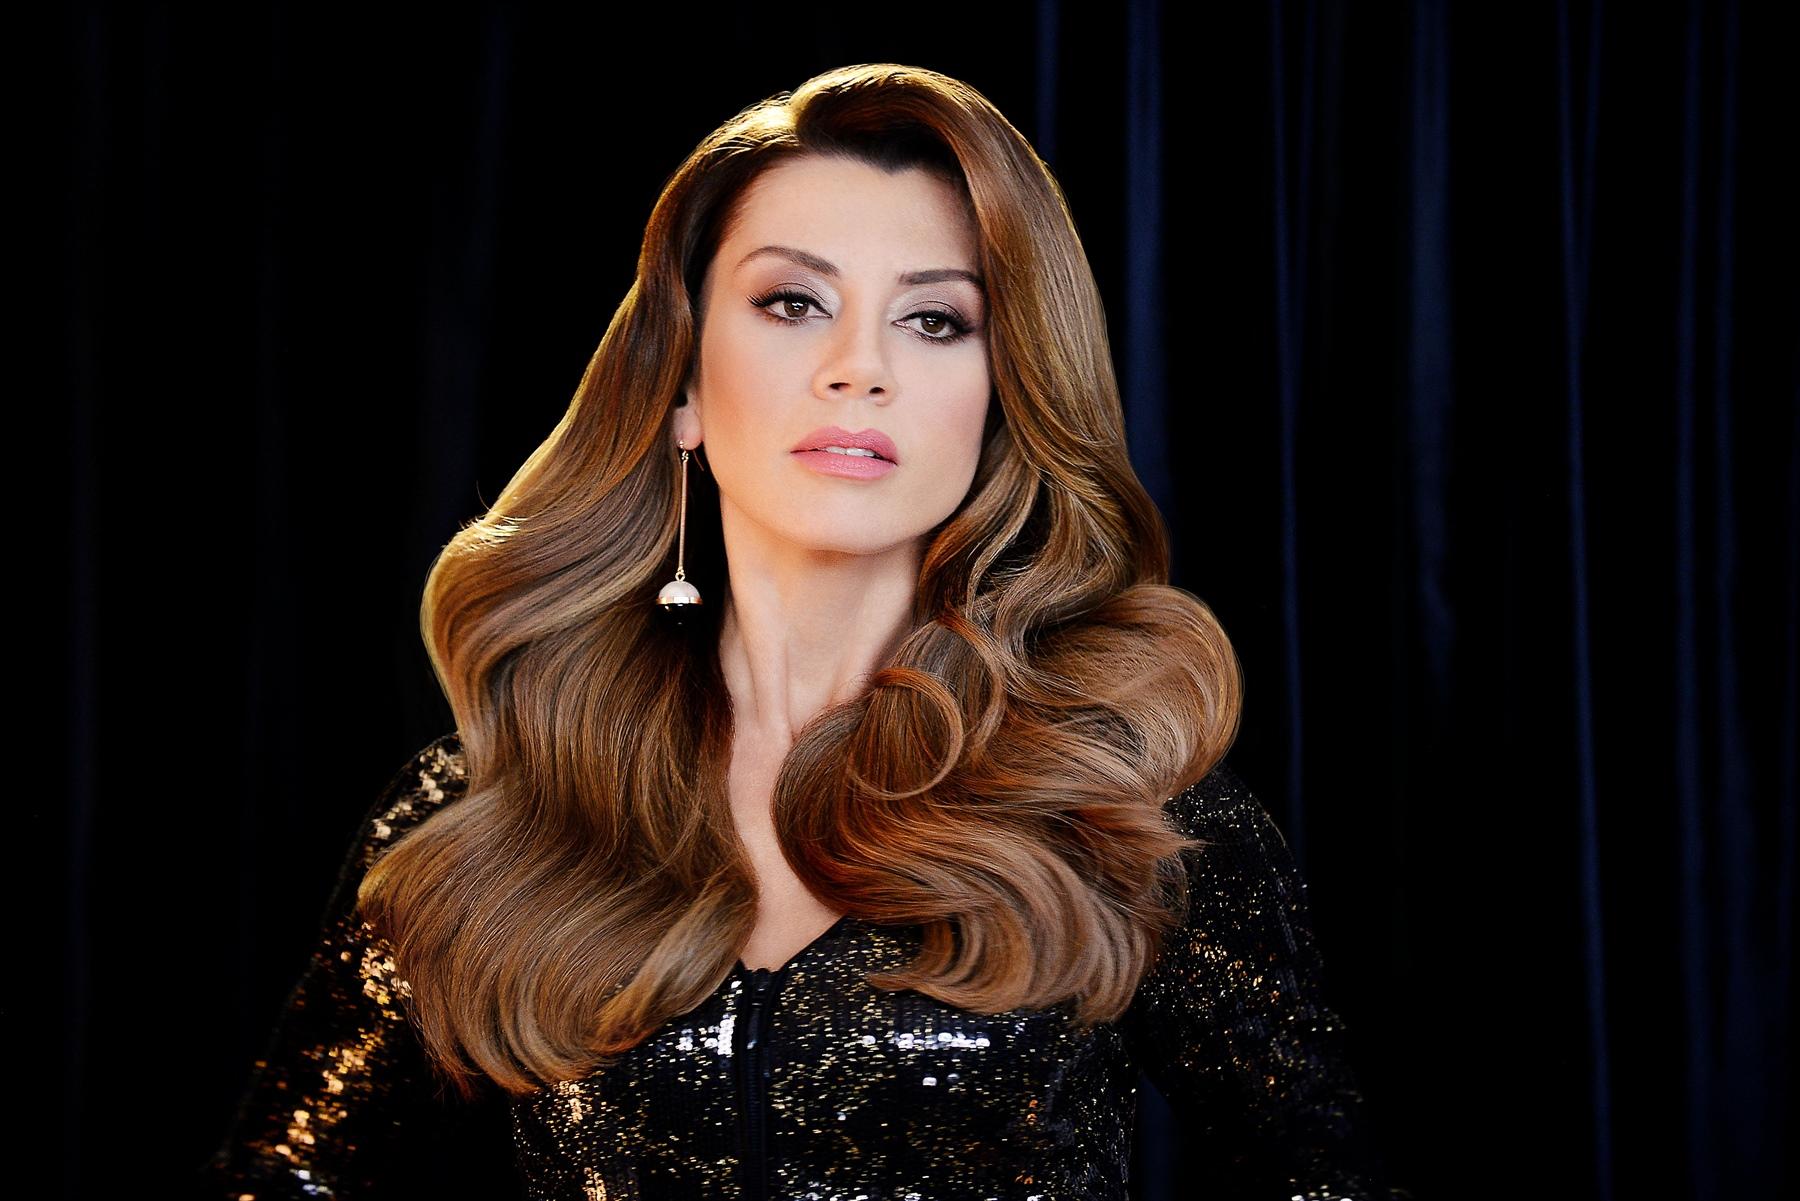 The beautiful and talented Turkish actress Gökçe Bahadır